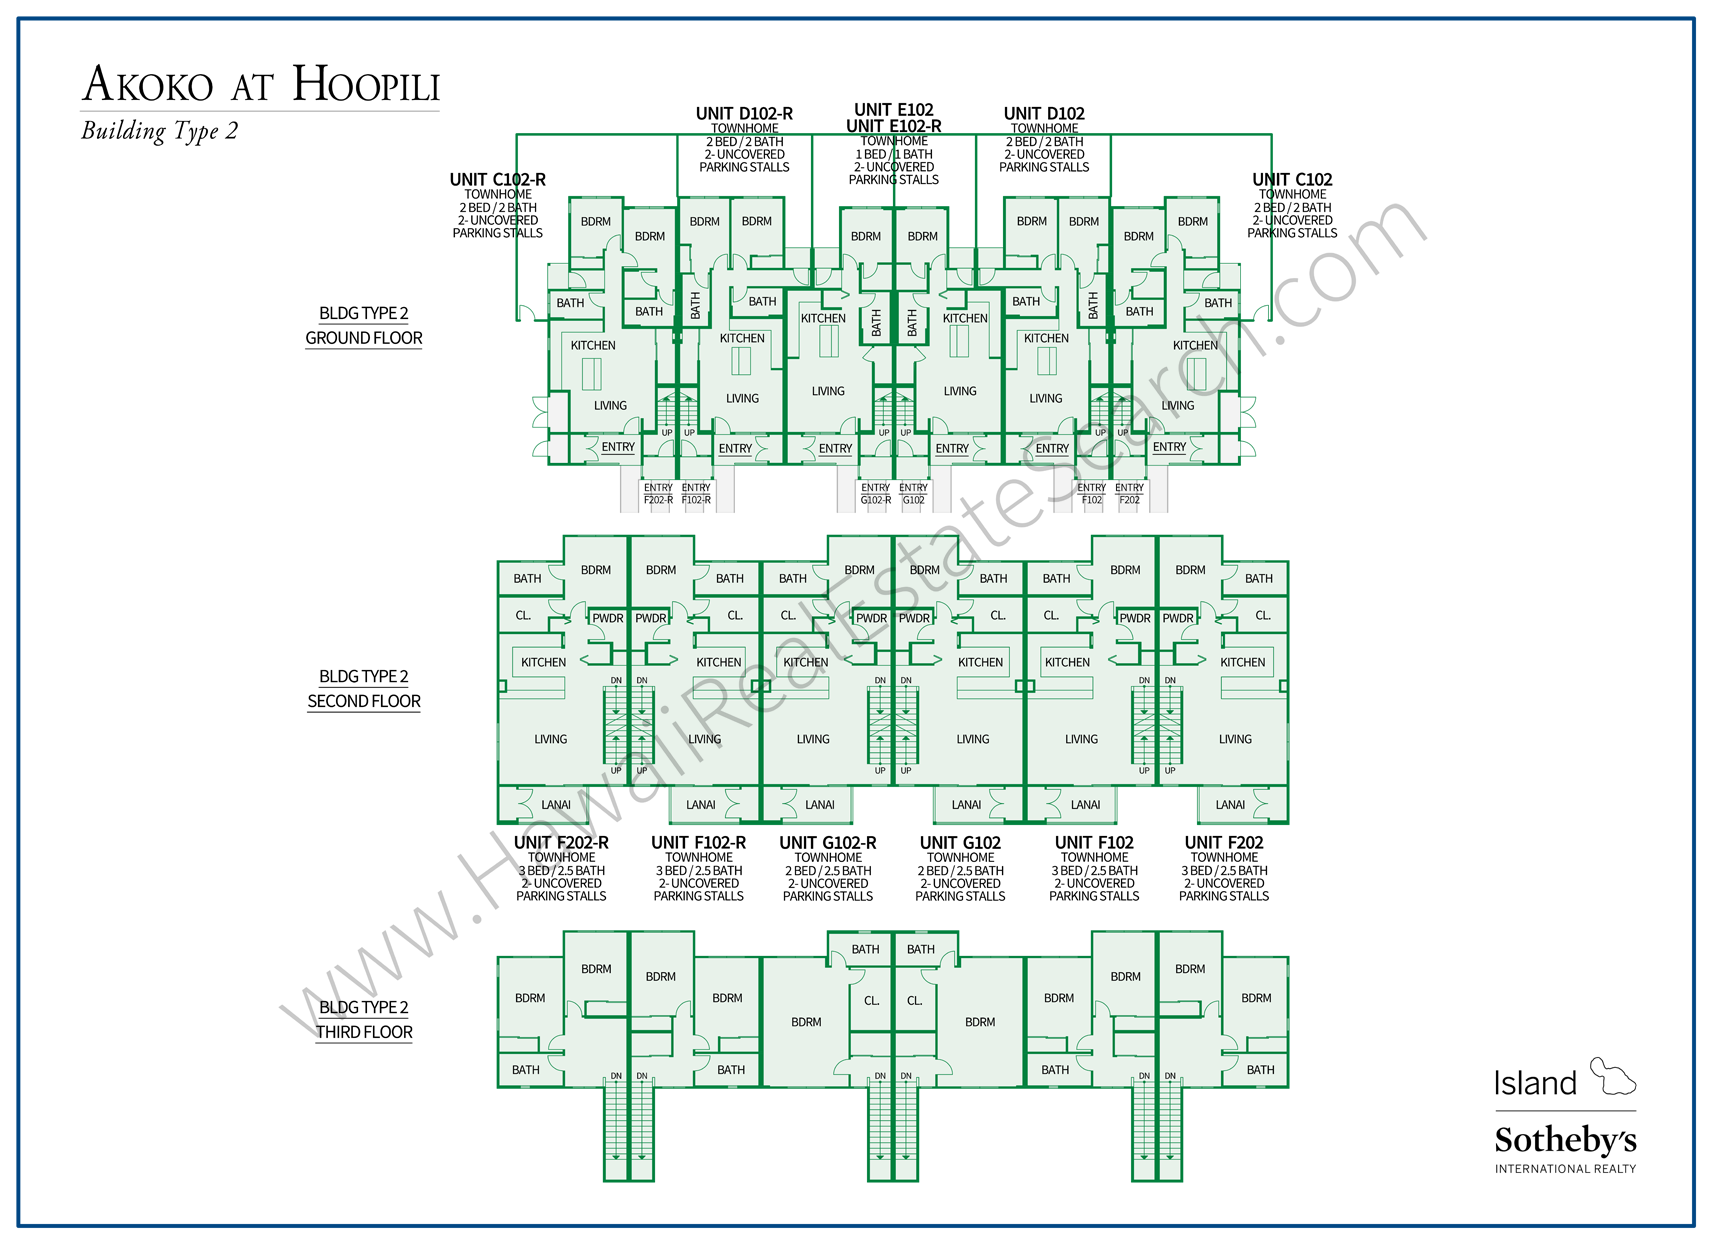 Akoko At Hoopili Real Estate For Sale Oahu Homes Condos